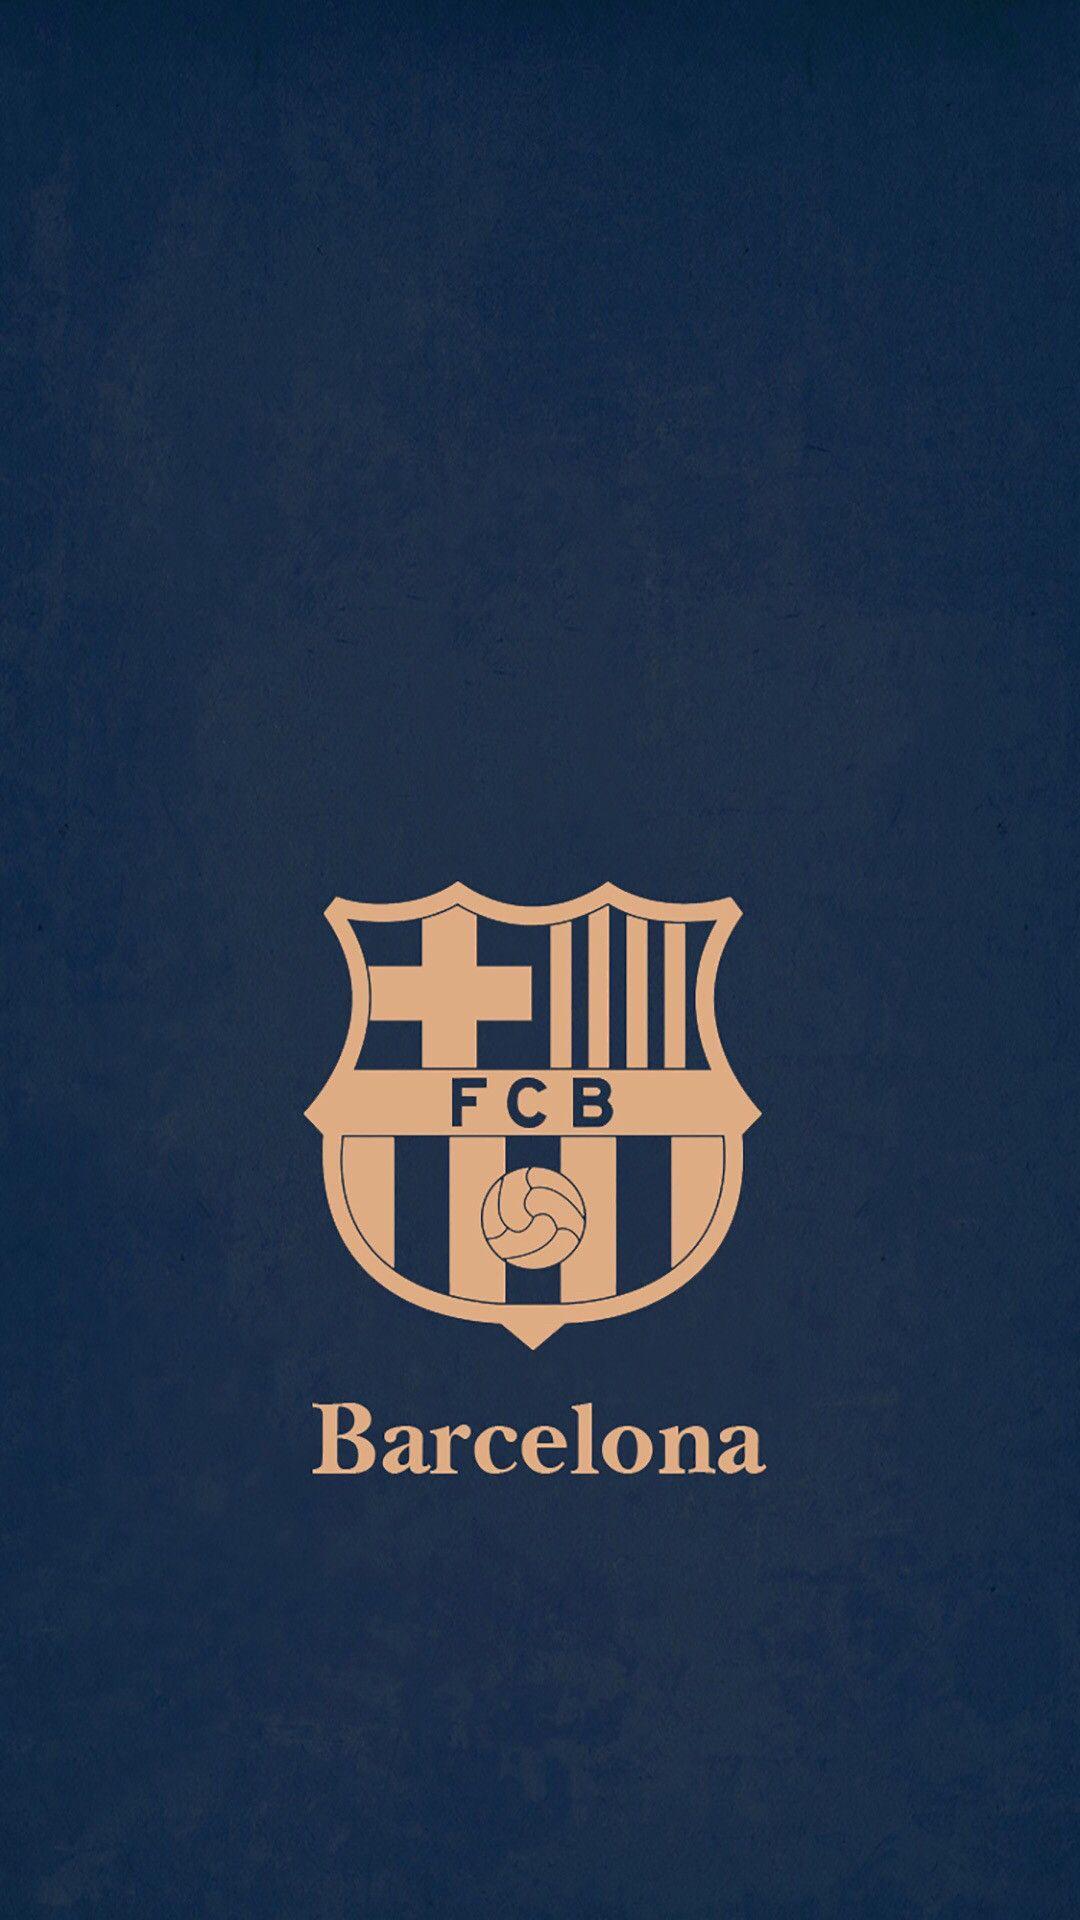 Fc Barcelona 4k Iphone Wallpapers Wallpaper Cave